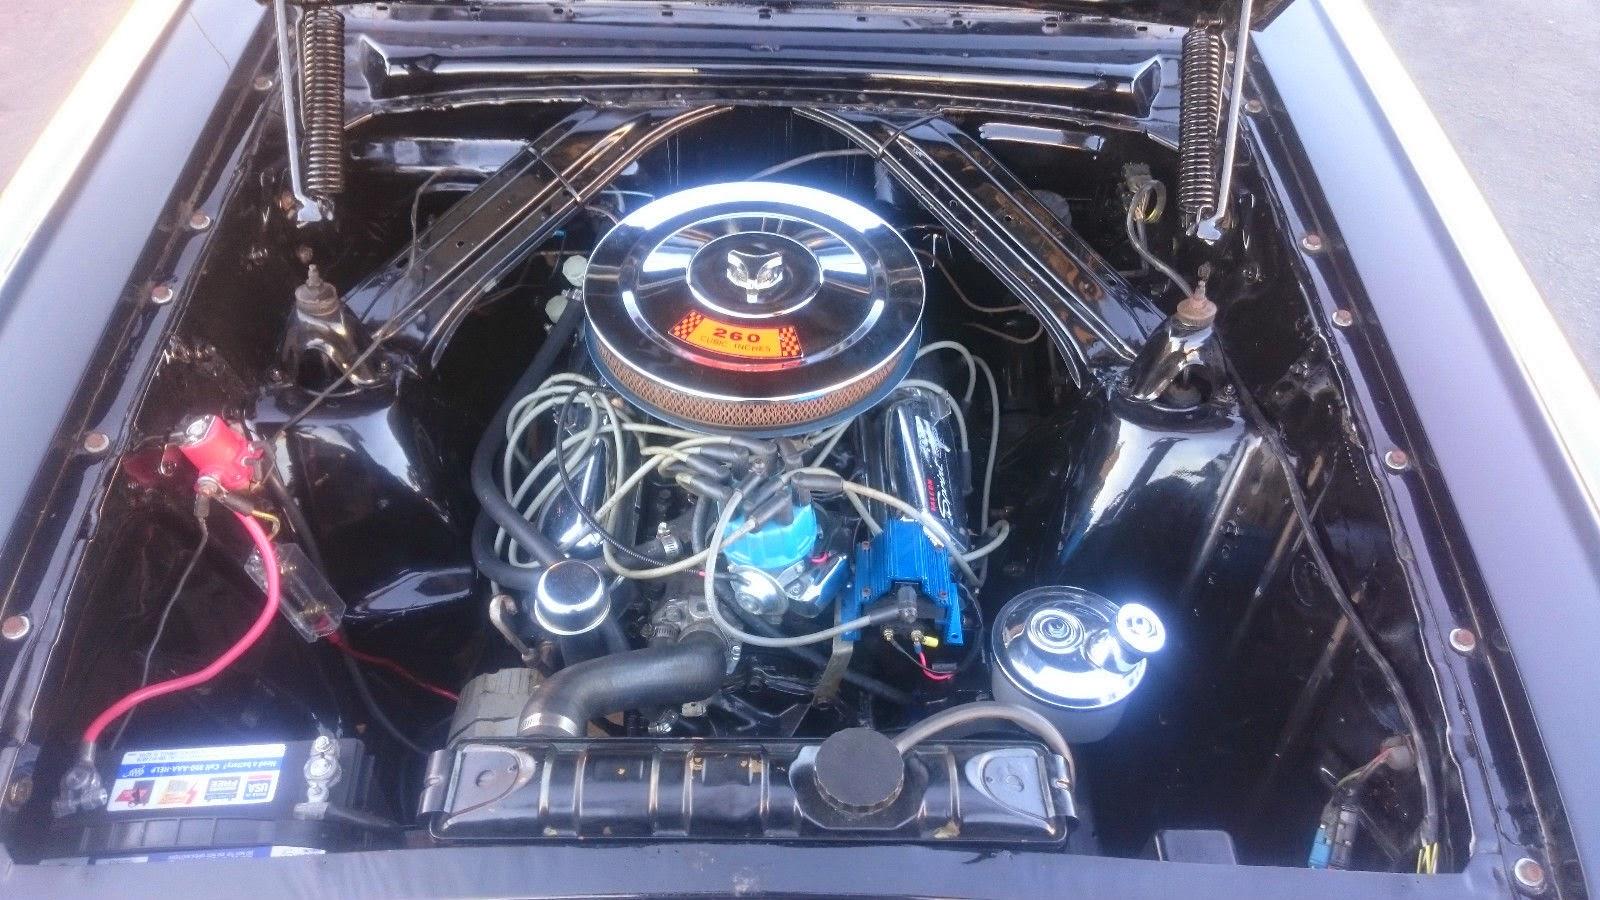 Daily Turismo: 15k: No Post: 1963 Ford Falcon Sprint